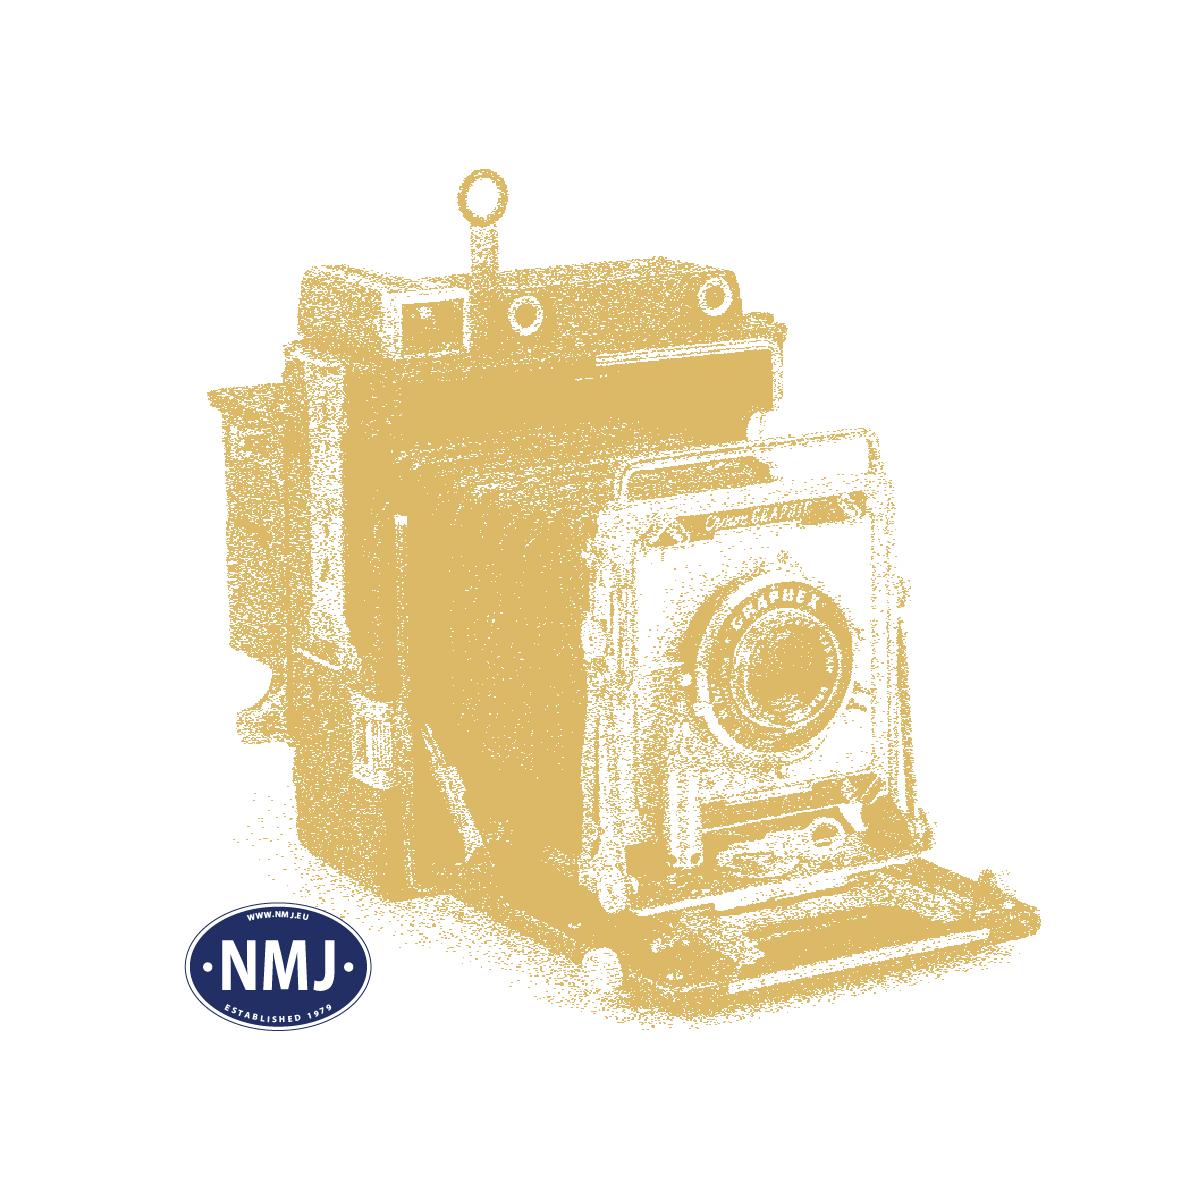 NMJST310924 - NMJ Superline NSB T3 10924 Stakevogn m/ Bremseplattform